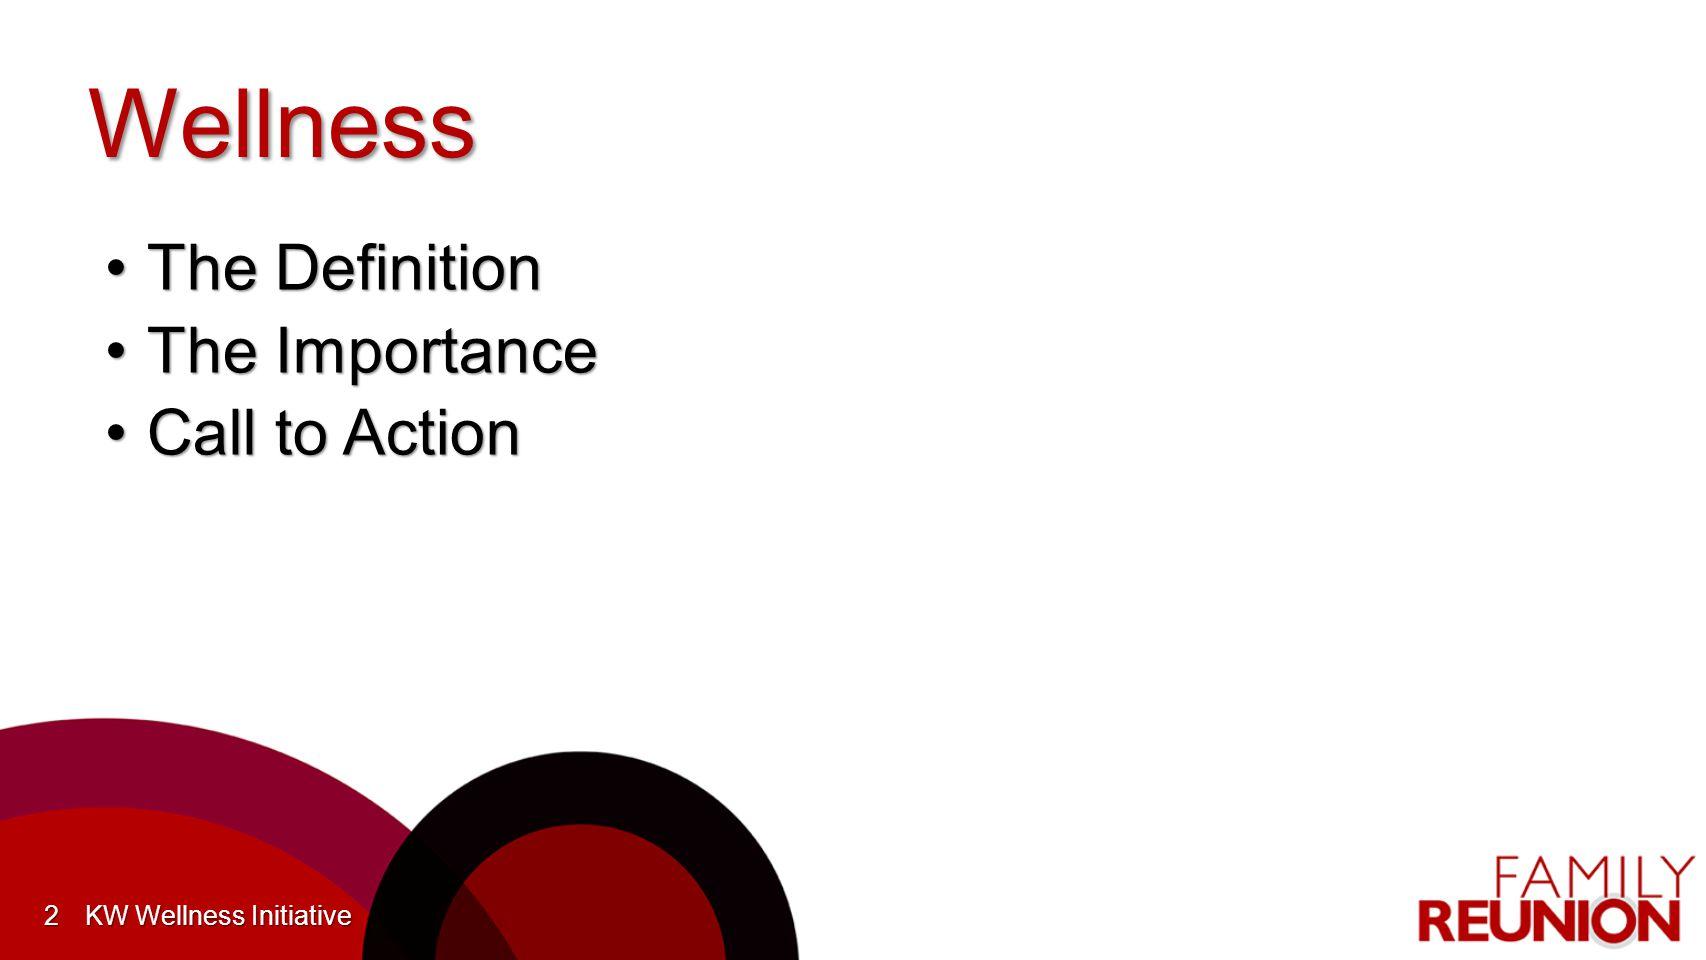 Sign Up! KW Wellness Initiative23 MyKW  Resources  KW Wellness